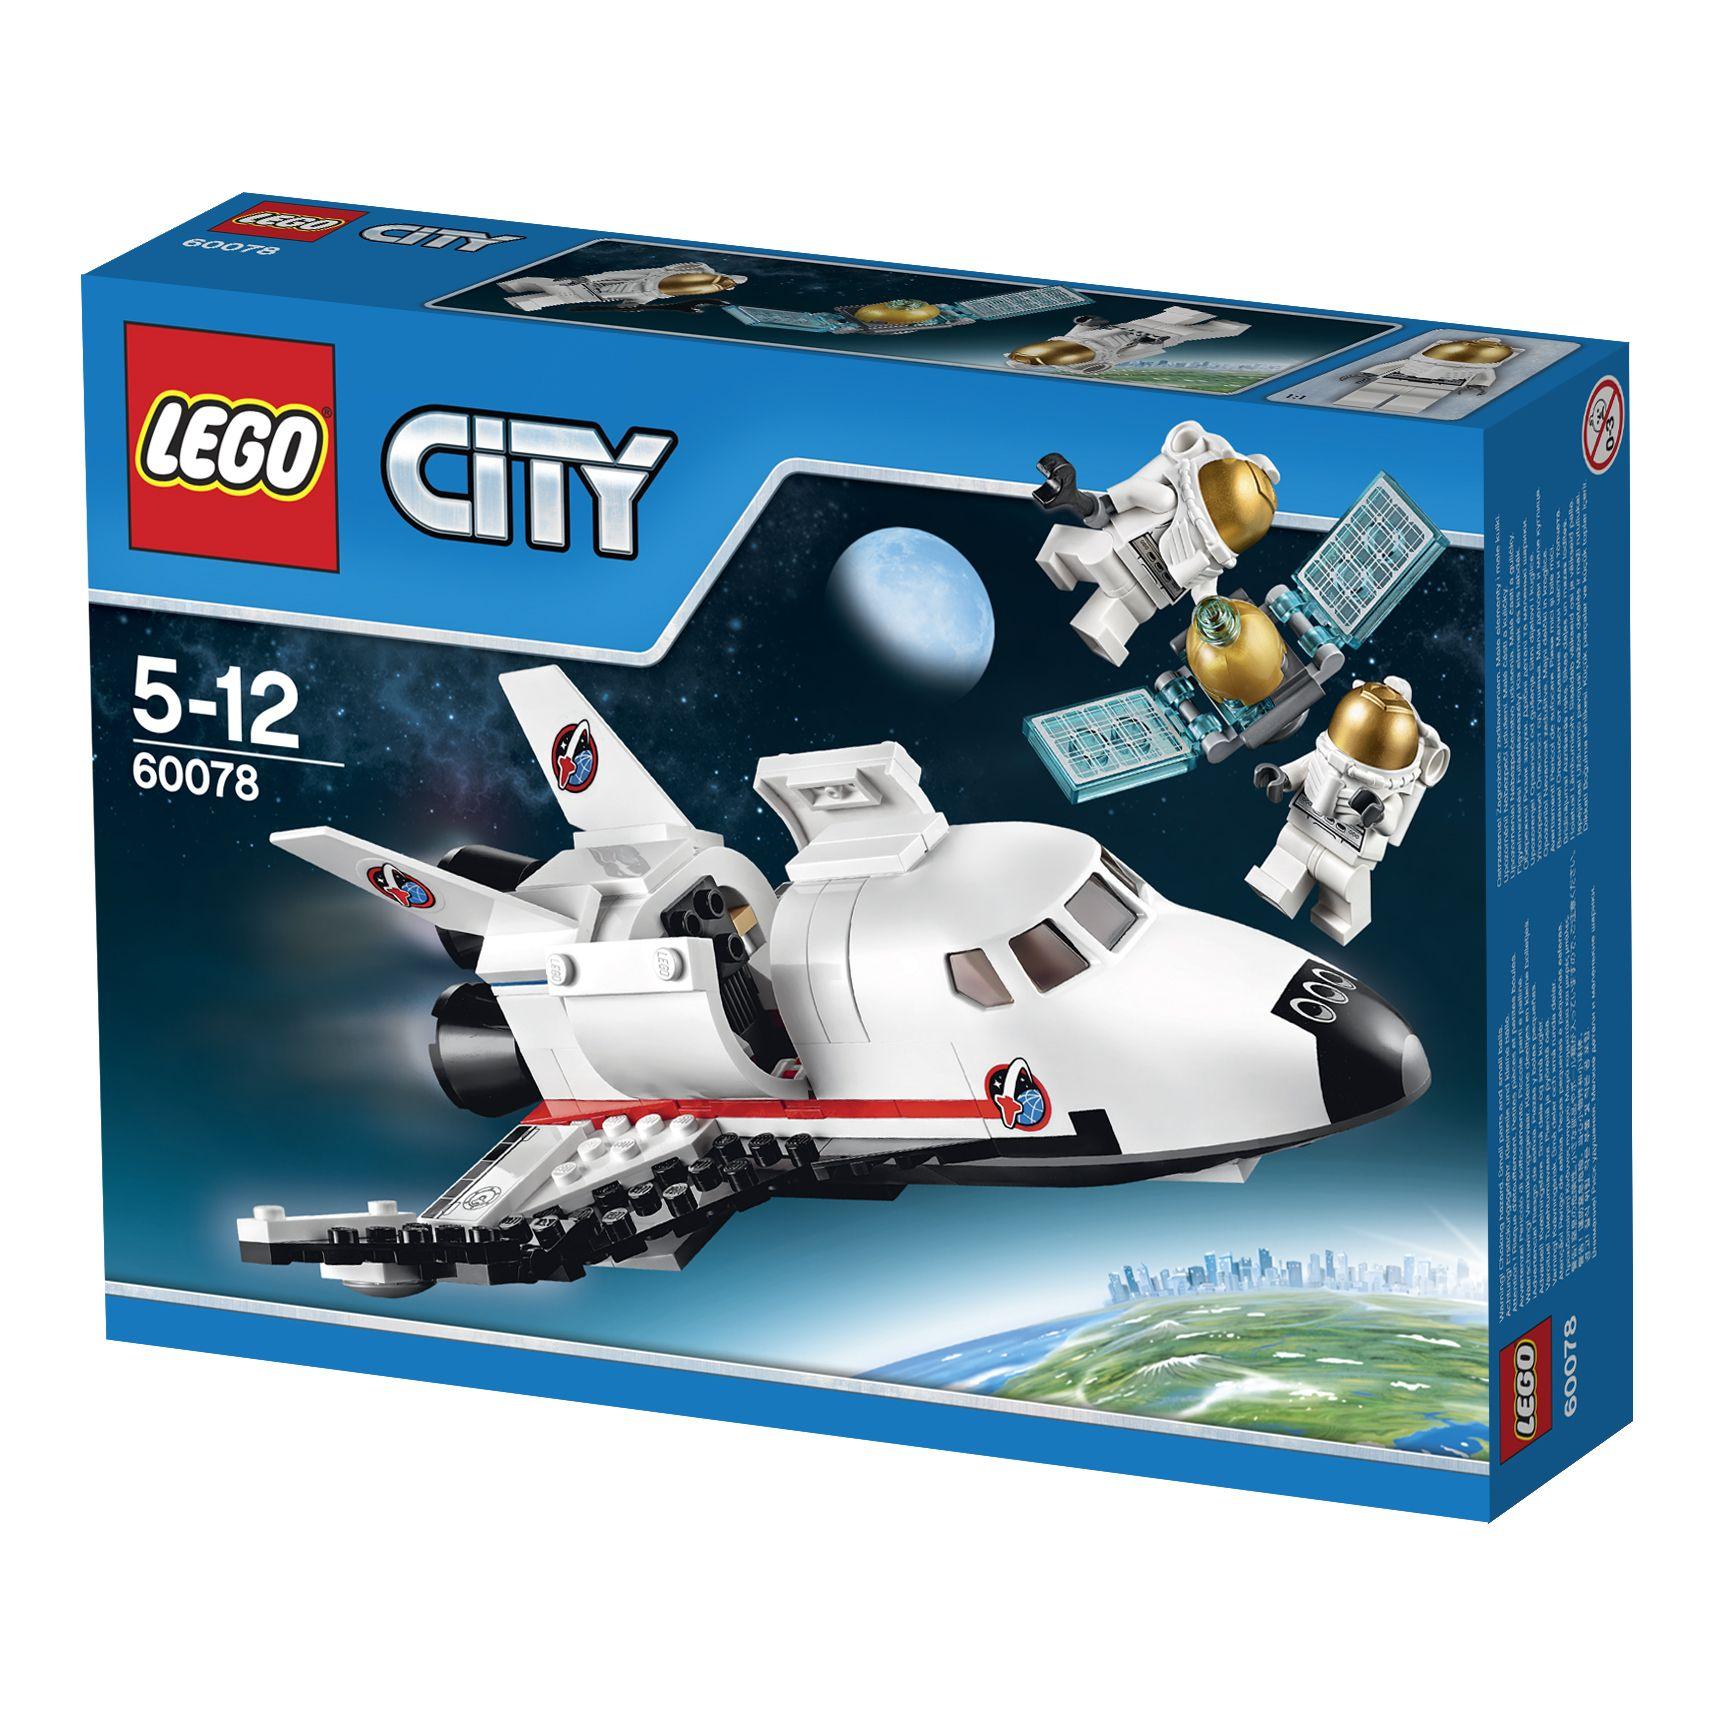 Lego City Weltraum Shuttle Lego City Lego City Sets Lego City Space